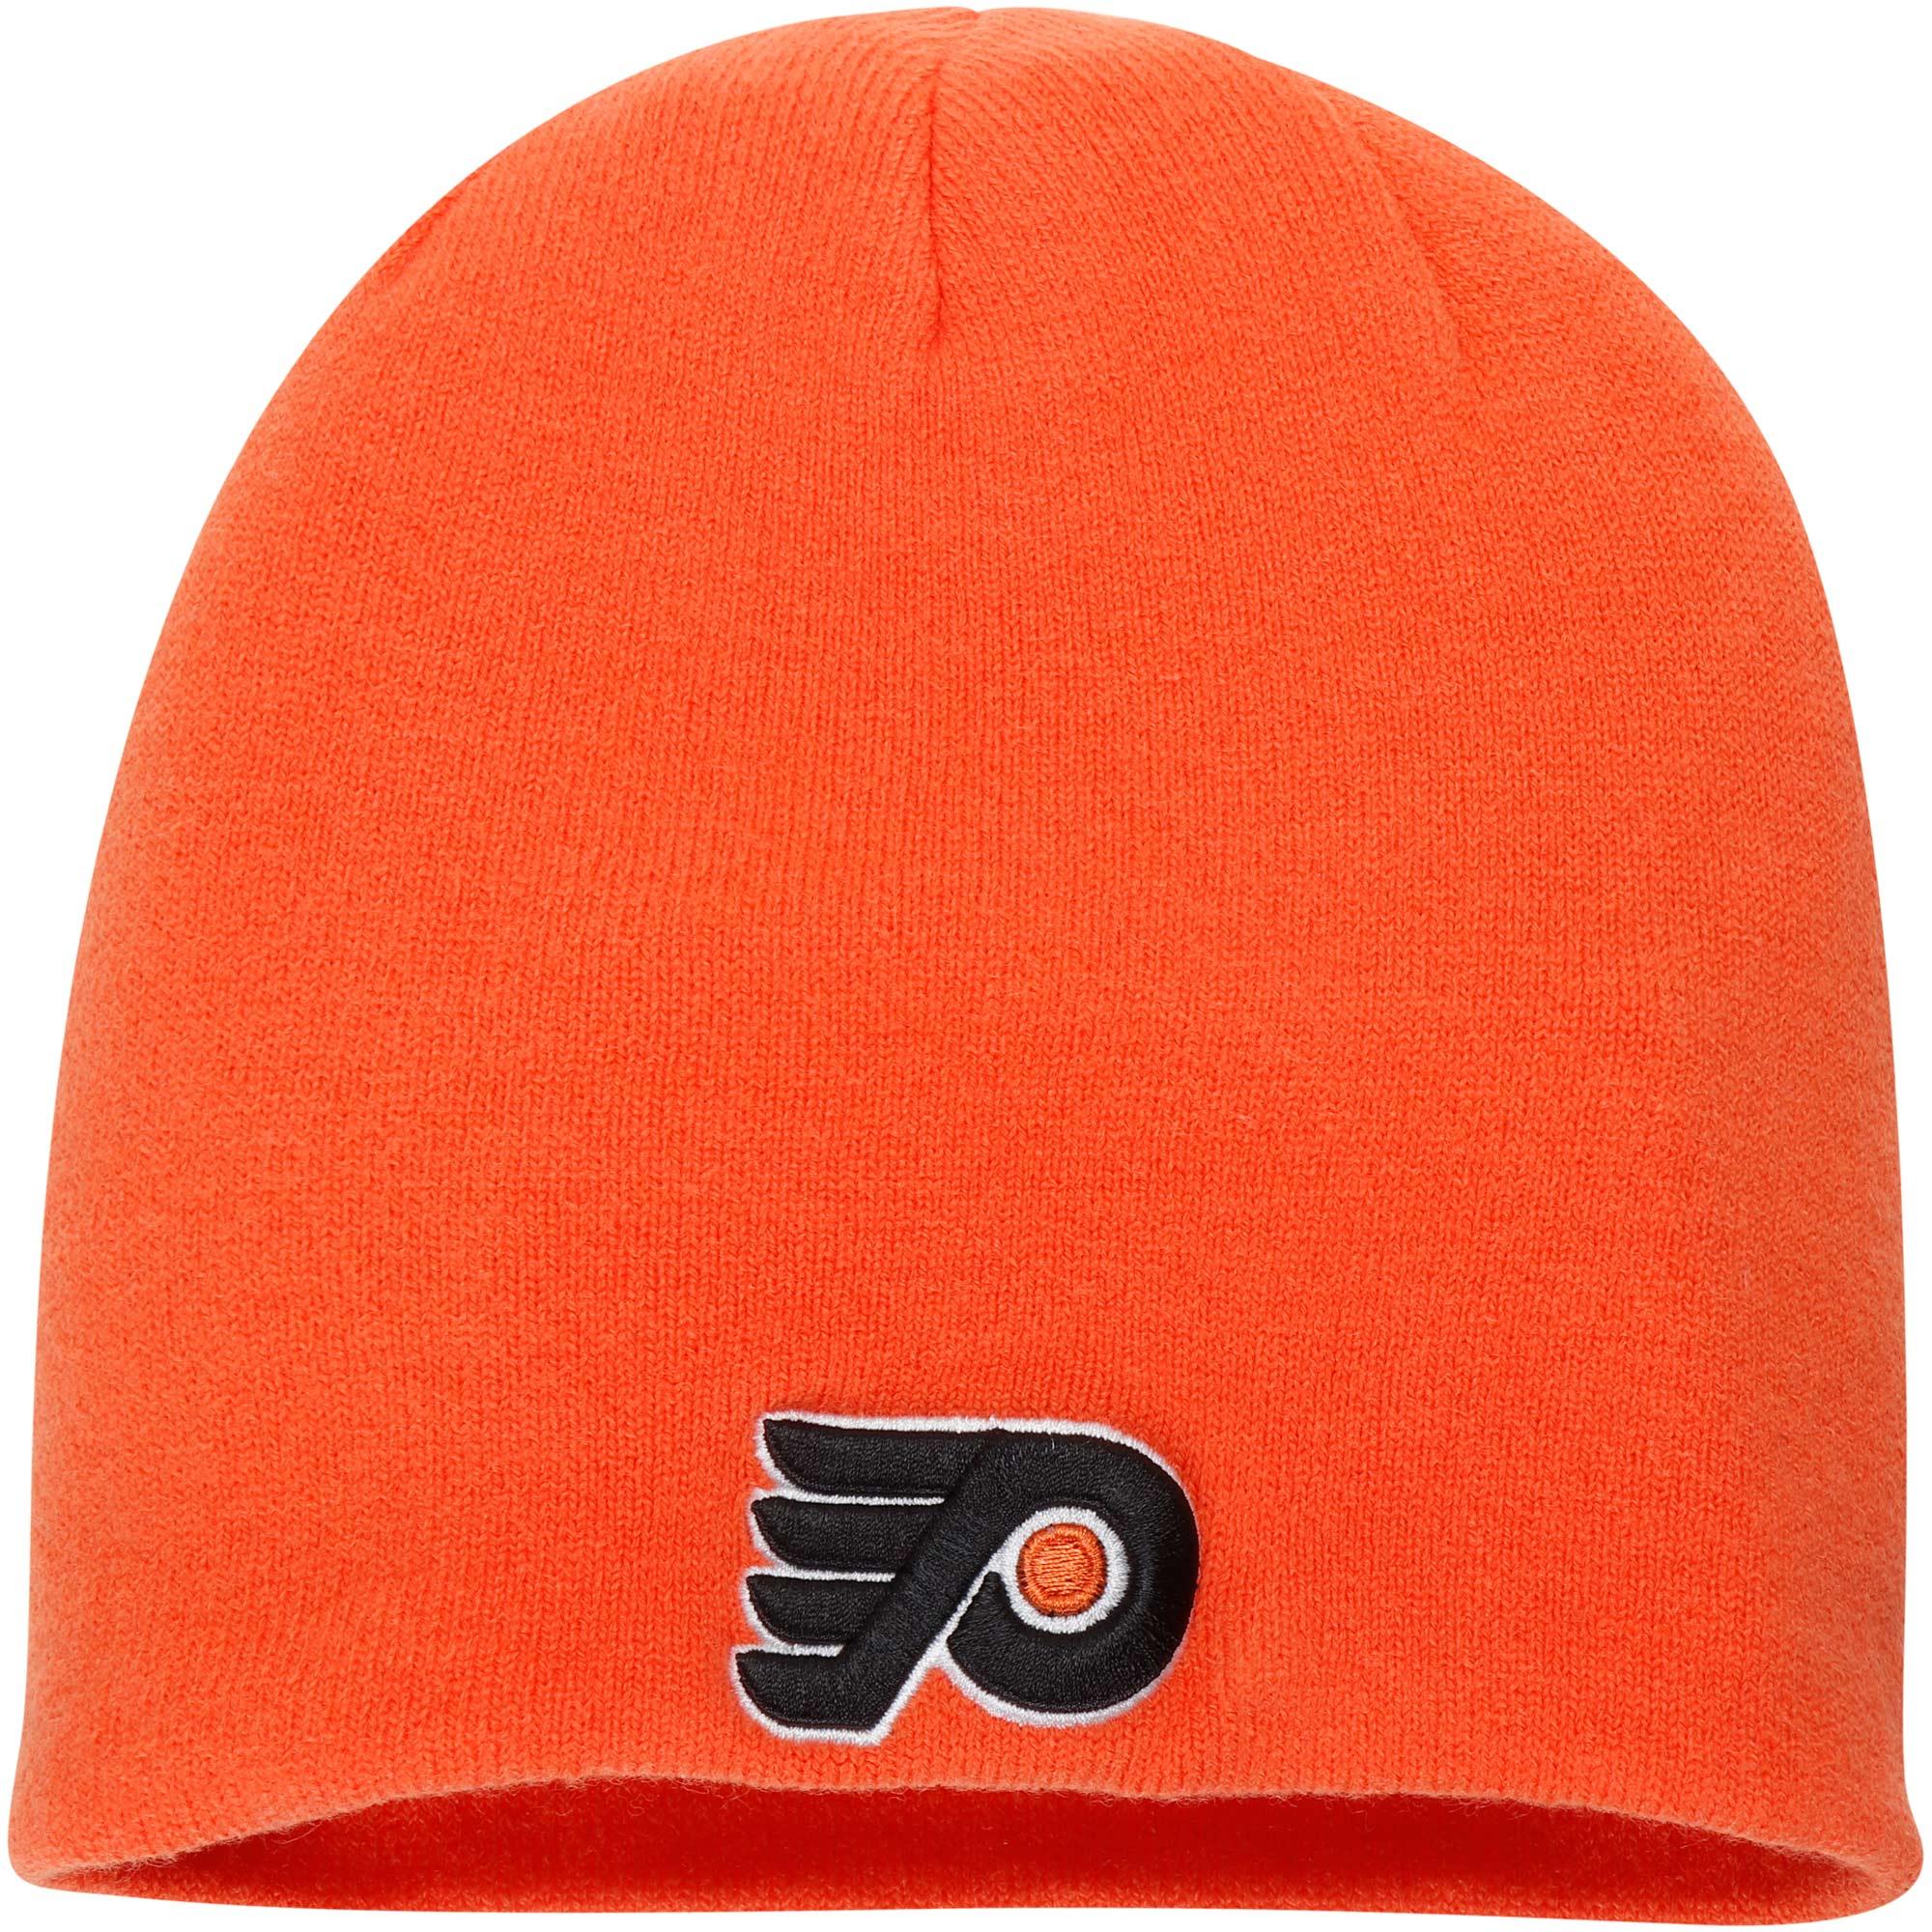 Philadelphia Flyers Fanatics Branded Core Knit Beanie - Orange - OSFA